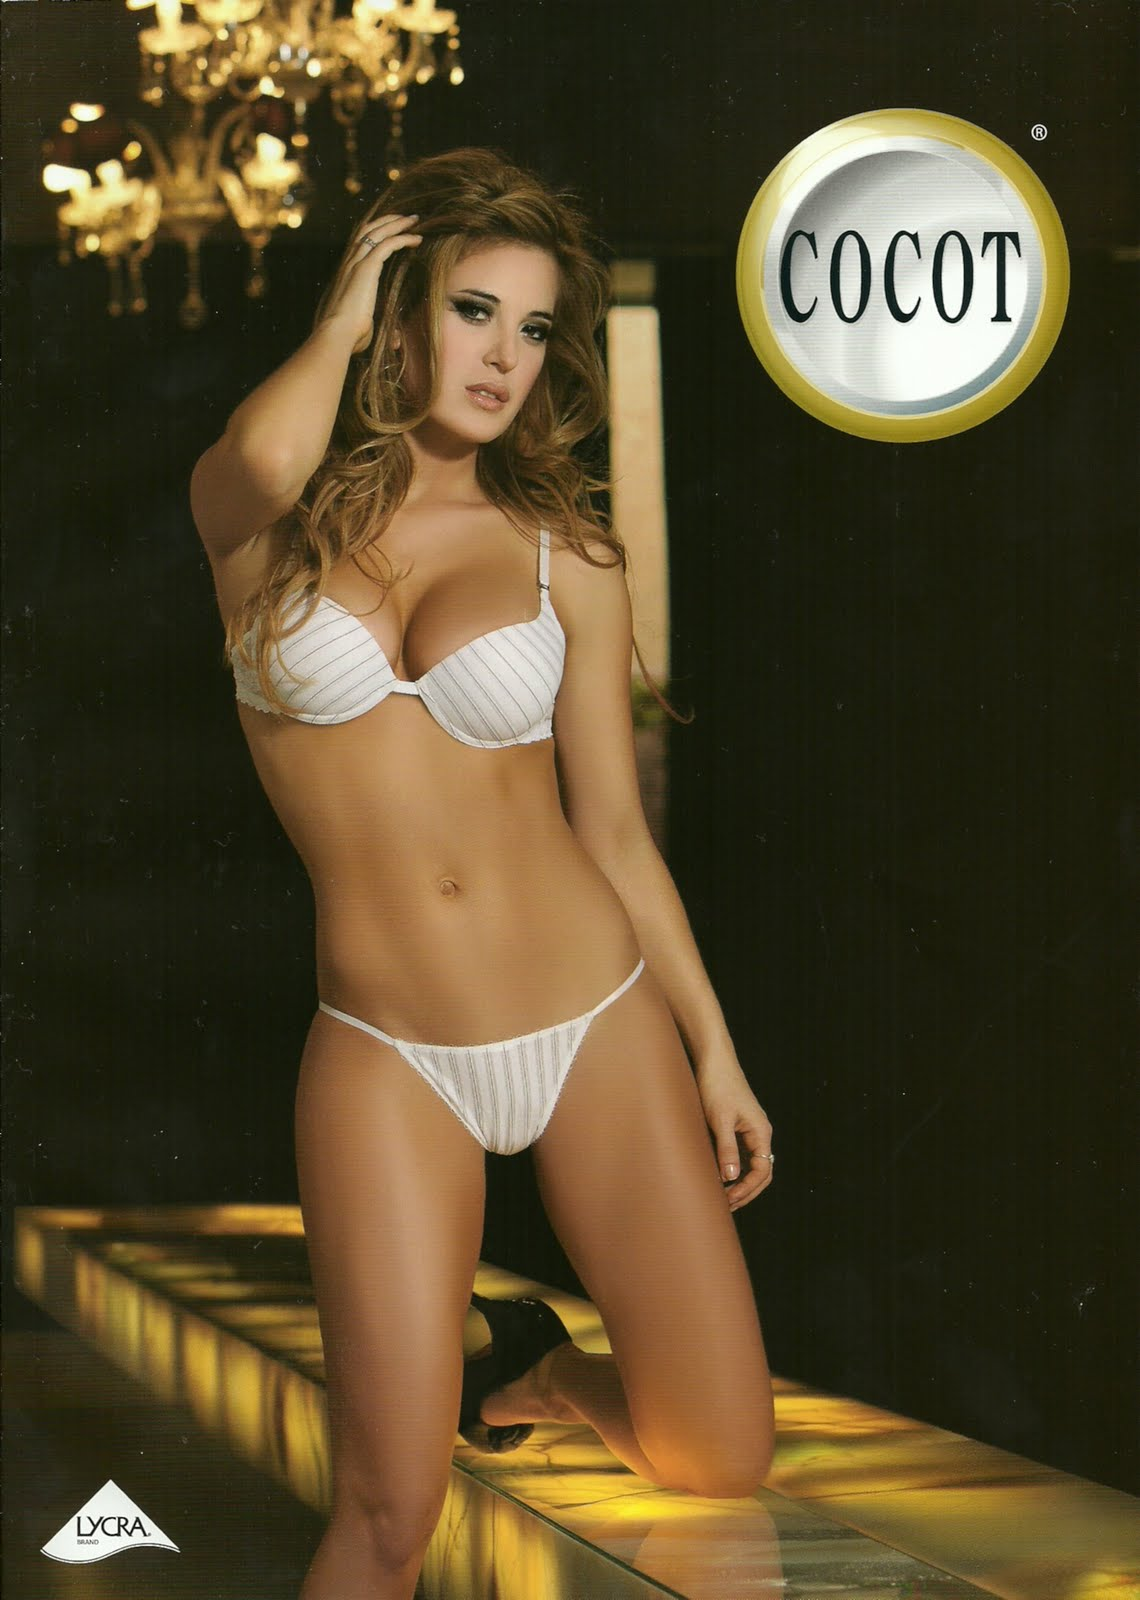 GS Lencería Mayorista  Nuevo Catálogo Lenceria COCOT!! Primavera ... 68b4bcc2a98a